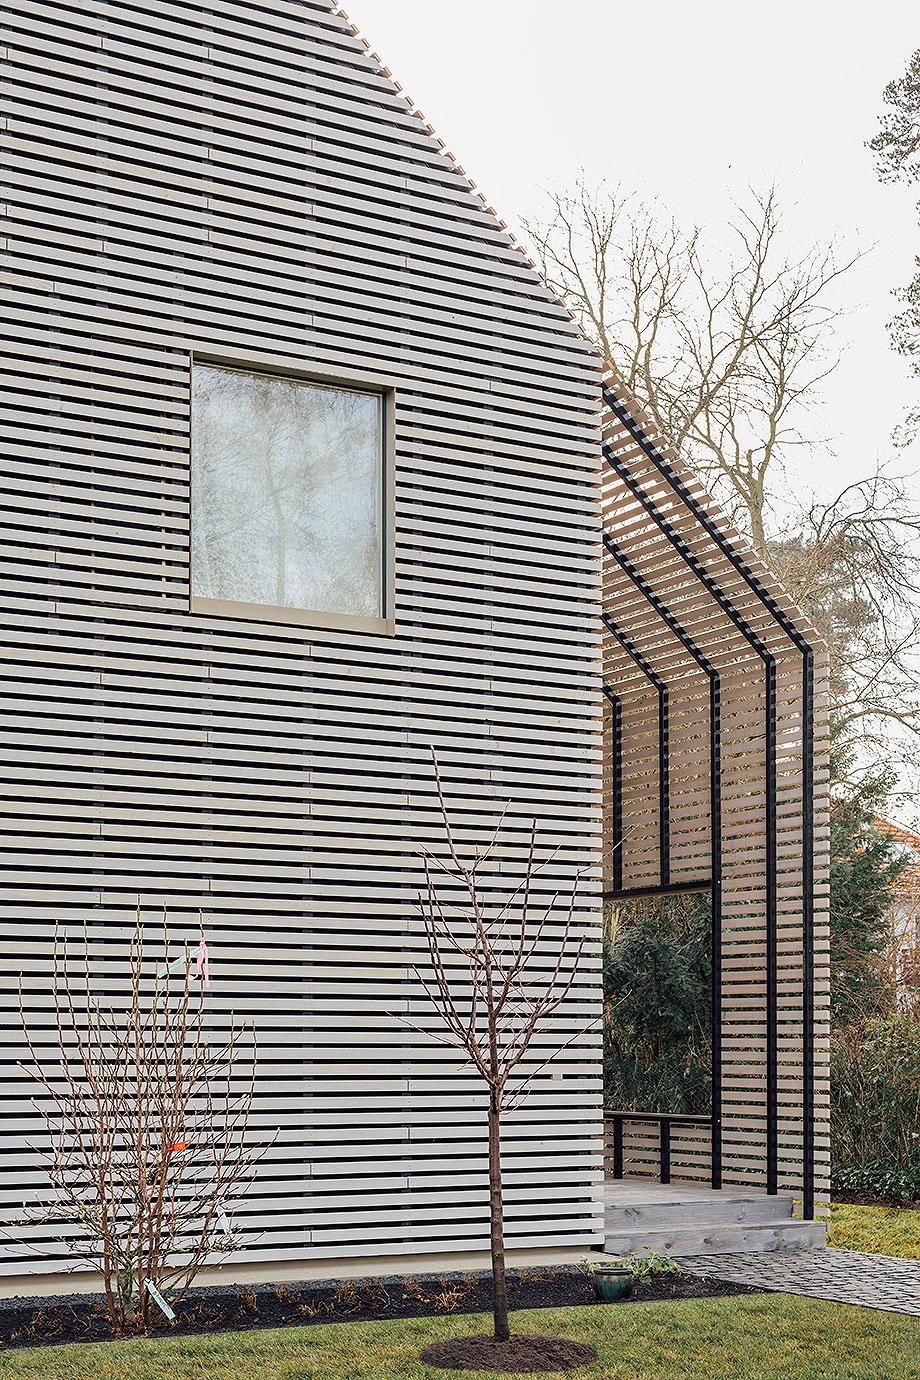 la casa de la pergola de rundzwei architekten (3) - foto gui rebelo